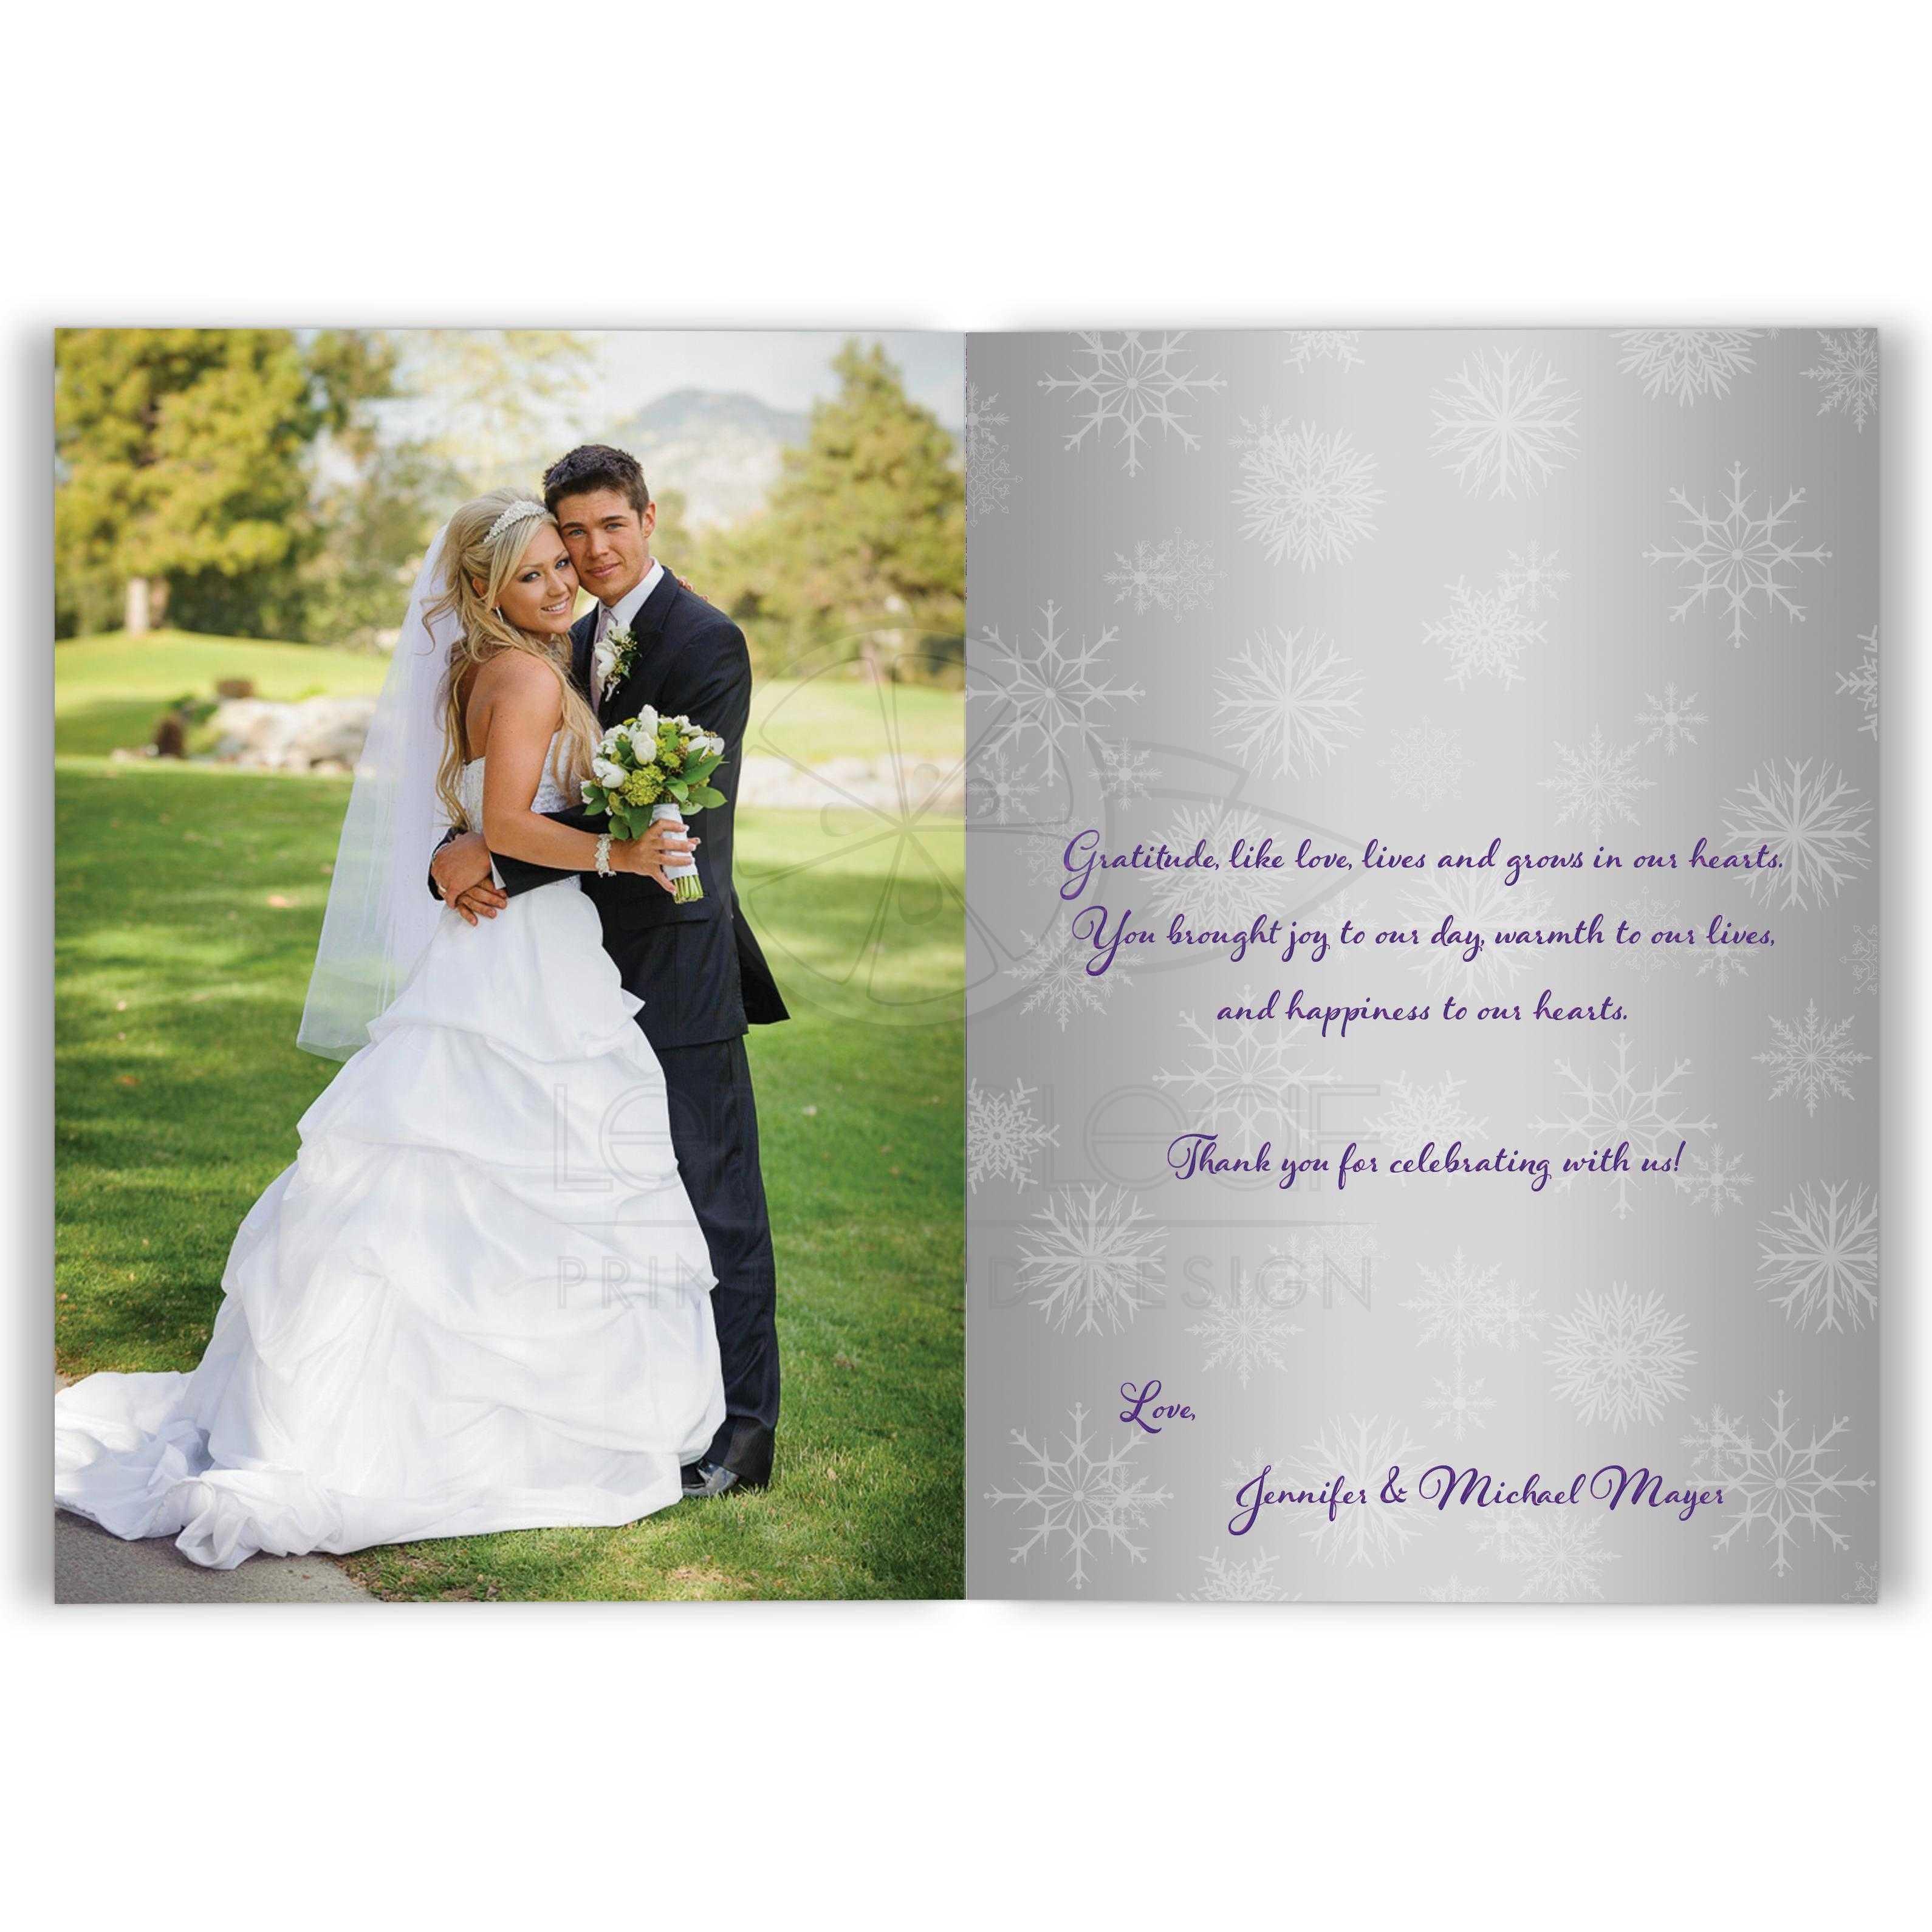 Double PHOTO Wedding Thank You Card Purple Silver White